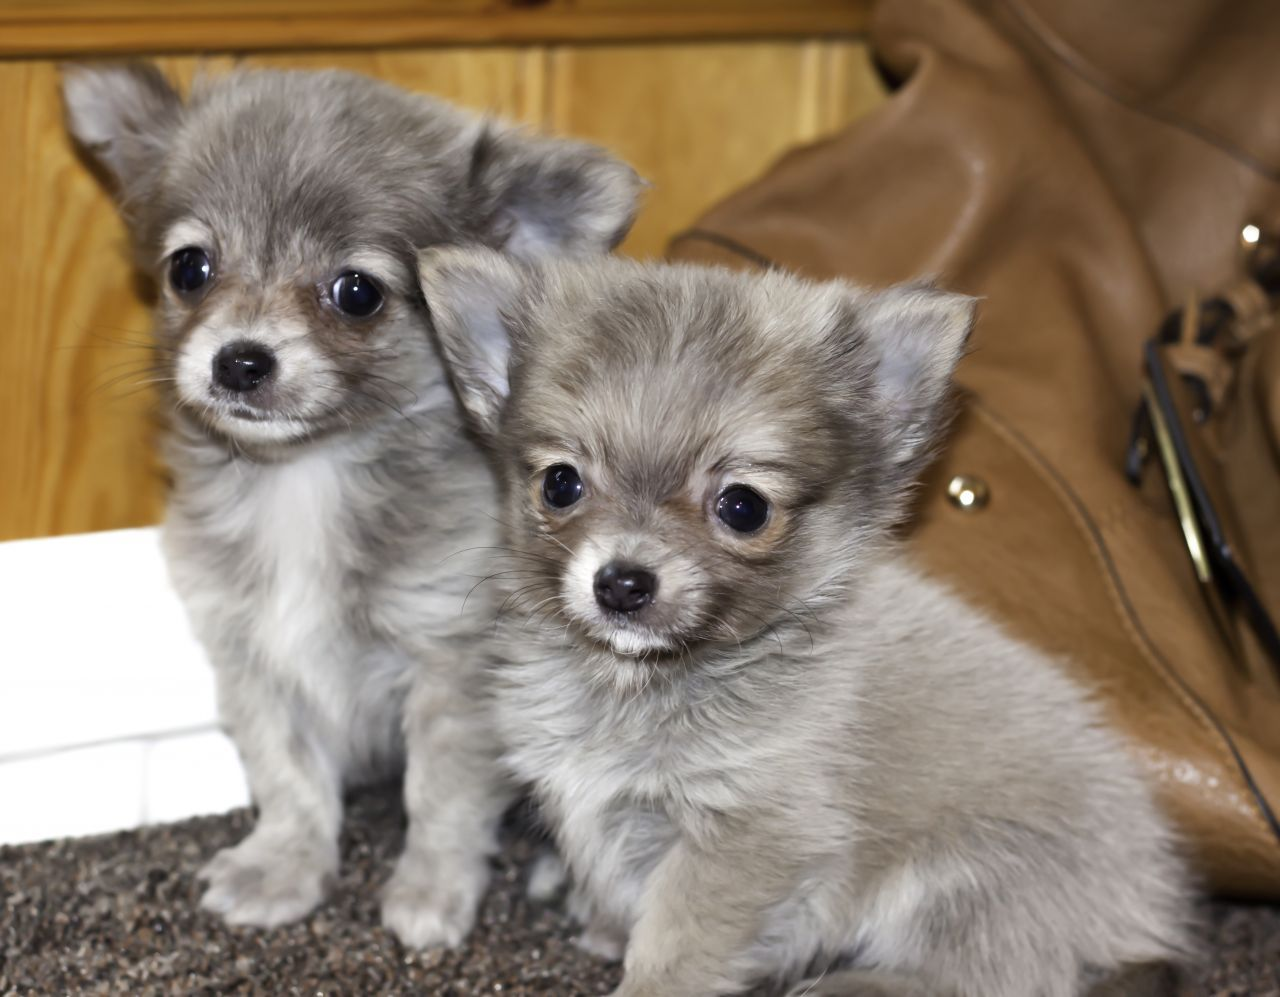 Silver Chihuahua Long Coat Chihuahua Dogs Cute Chihuahua Chihuahua Breeds